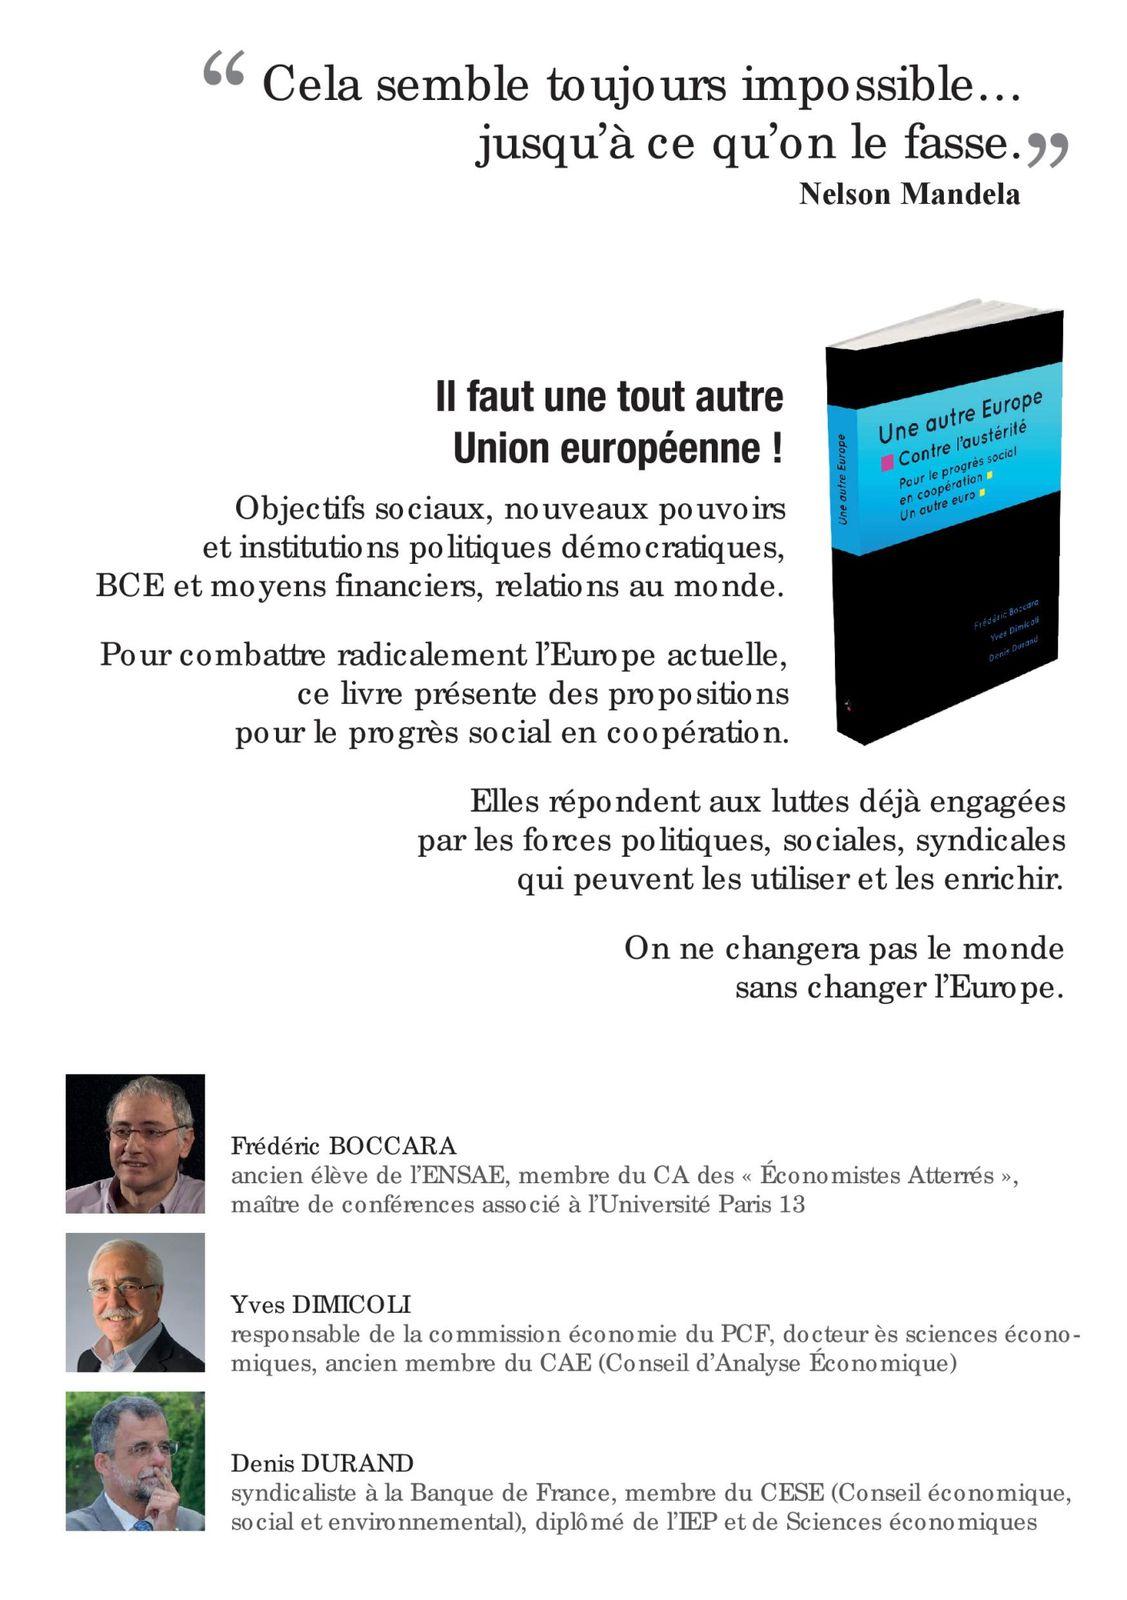 reu_europe_A5-page-002.jpg